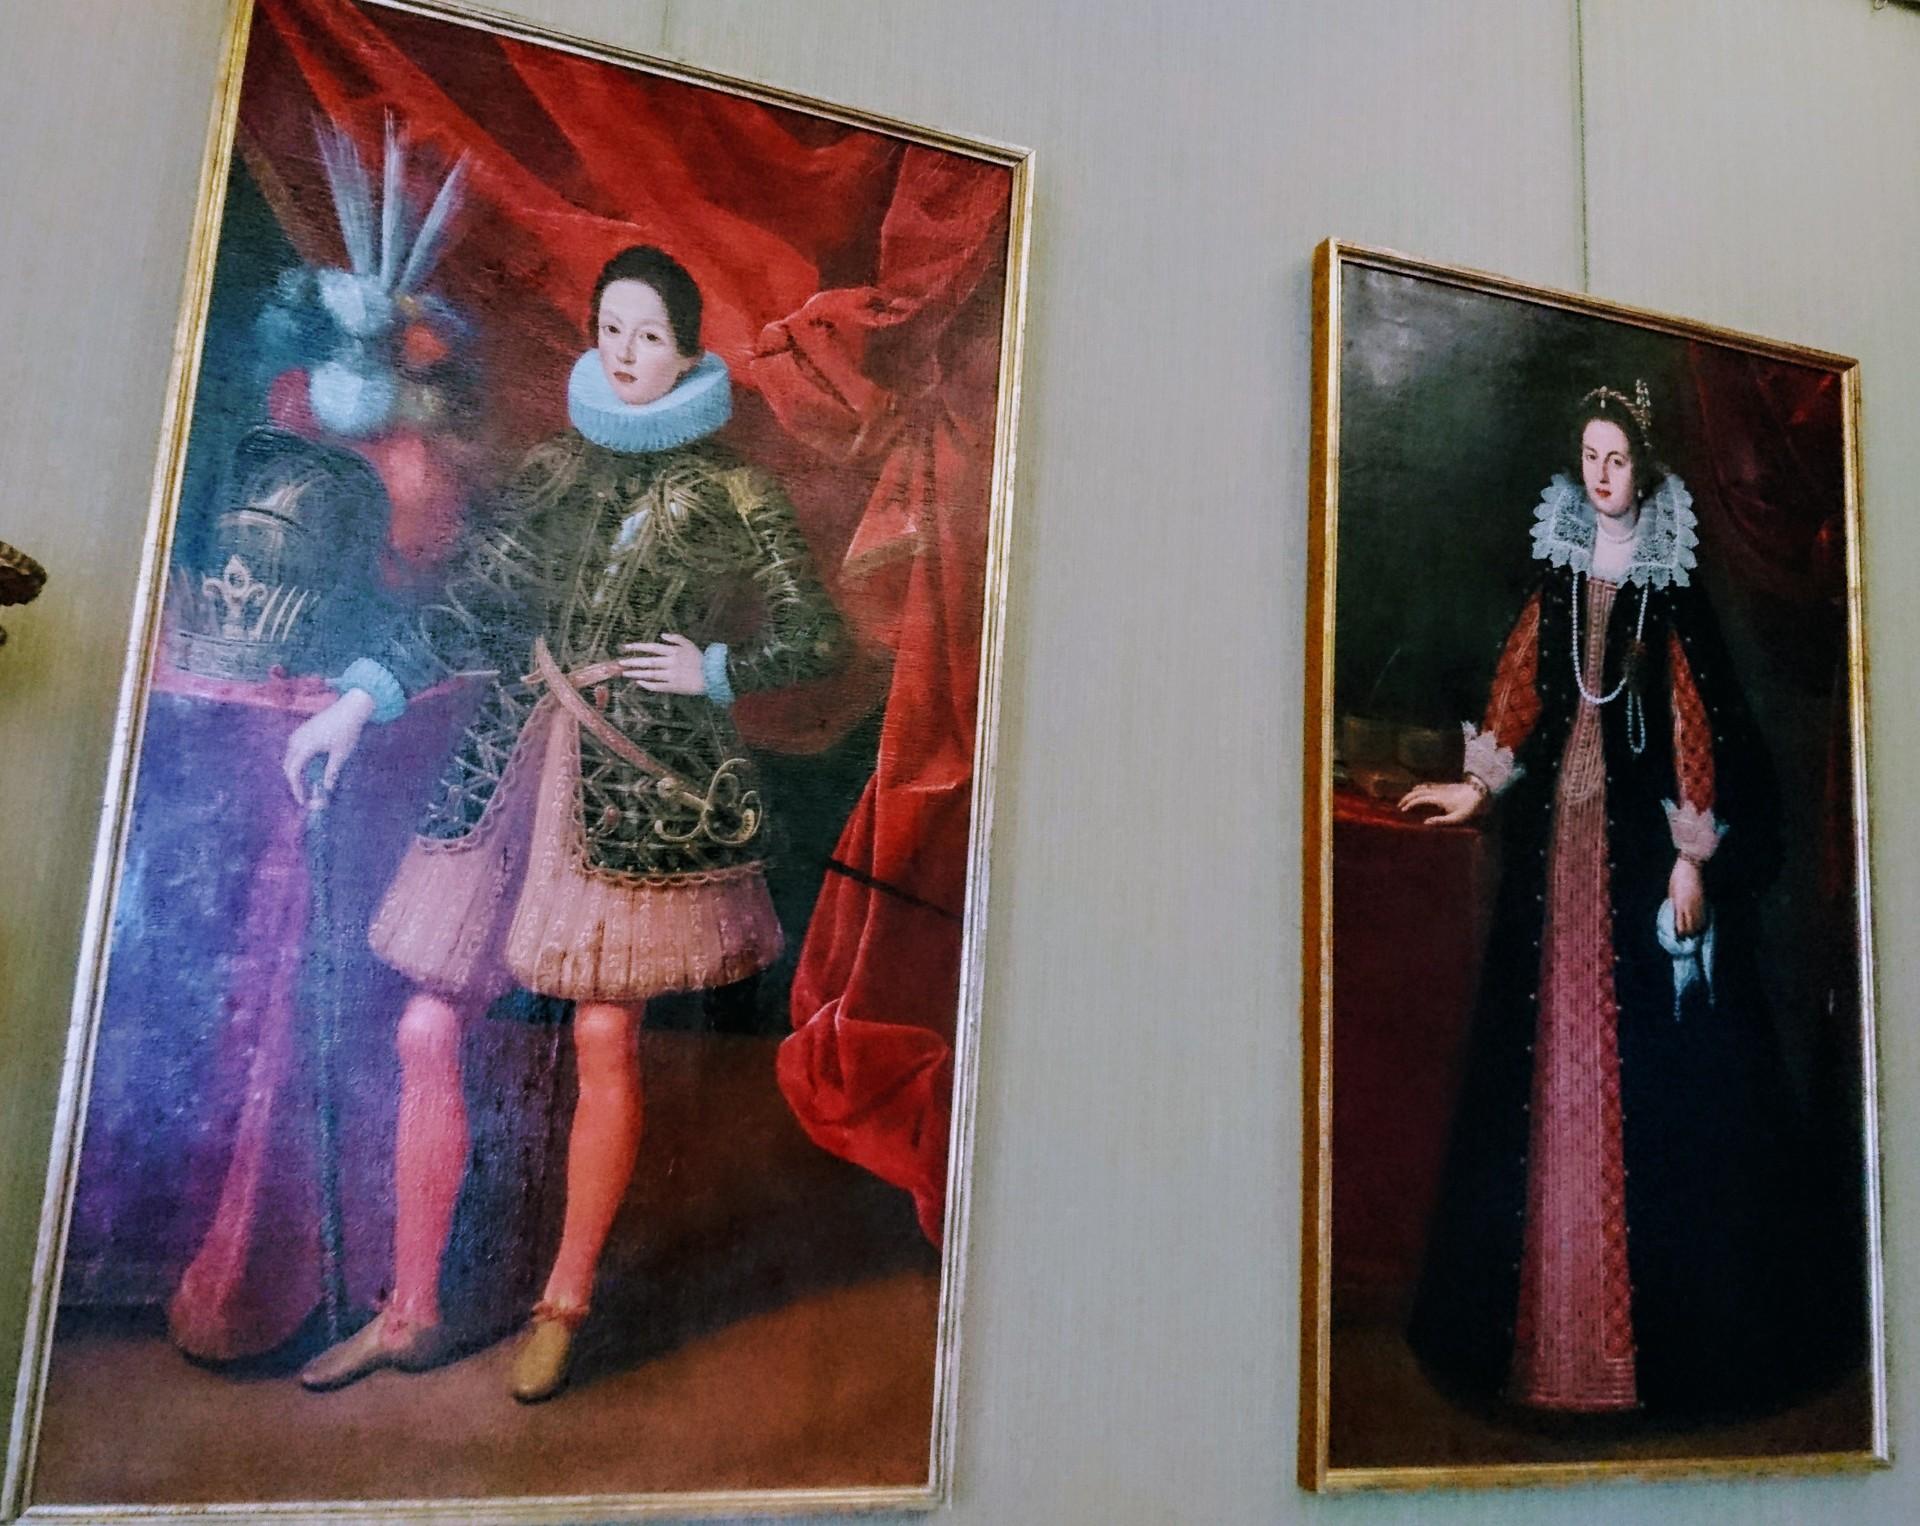 museo-di-palazzo-reale-2ef79b9f337f48846